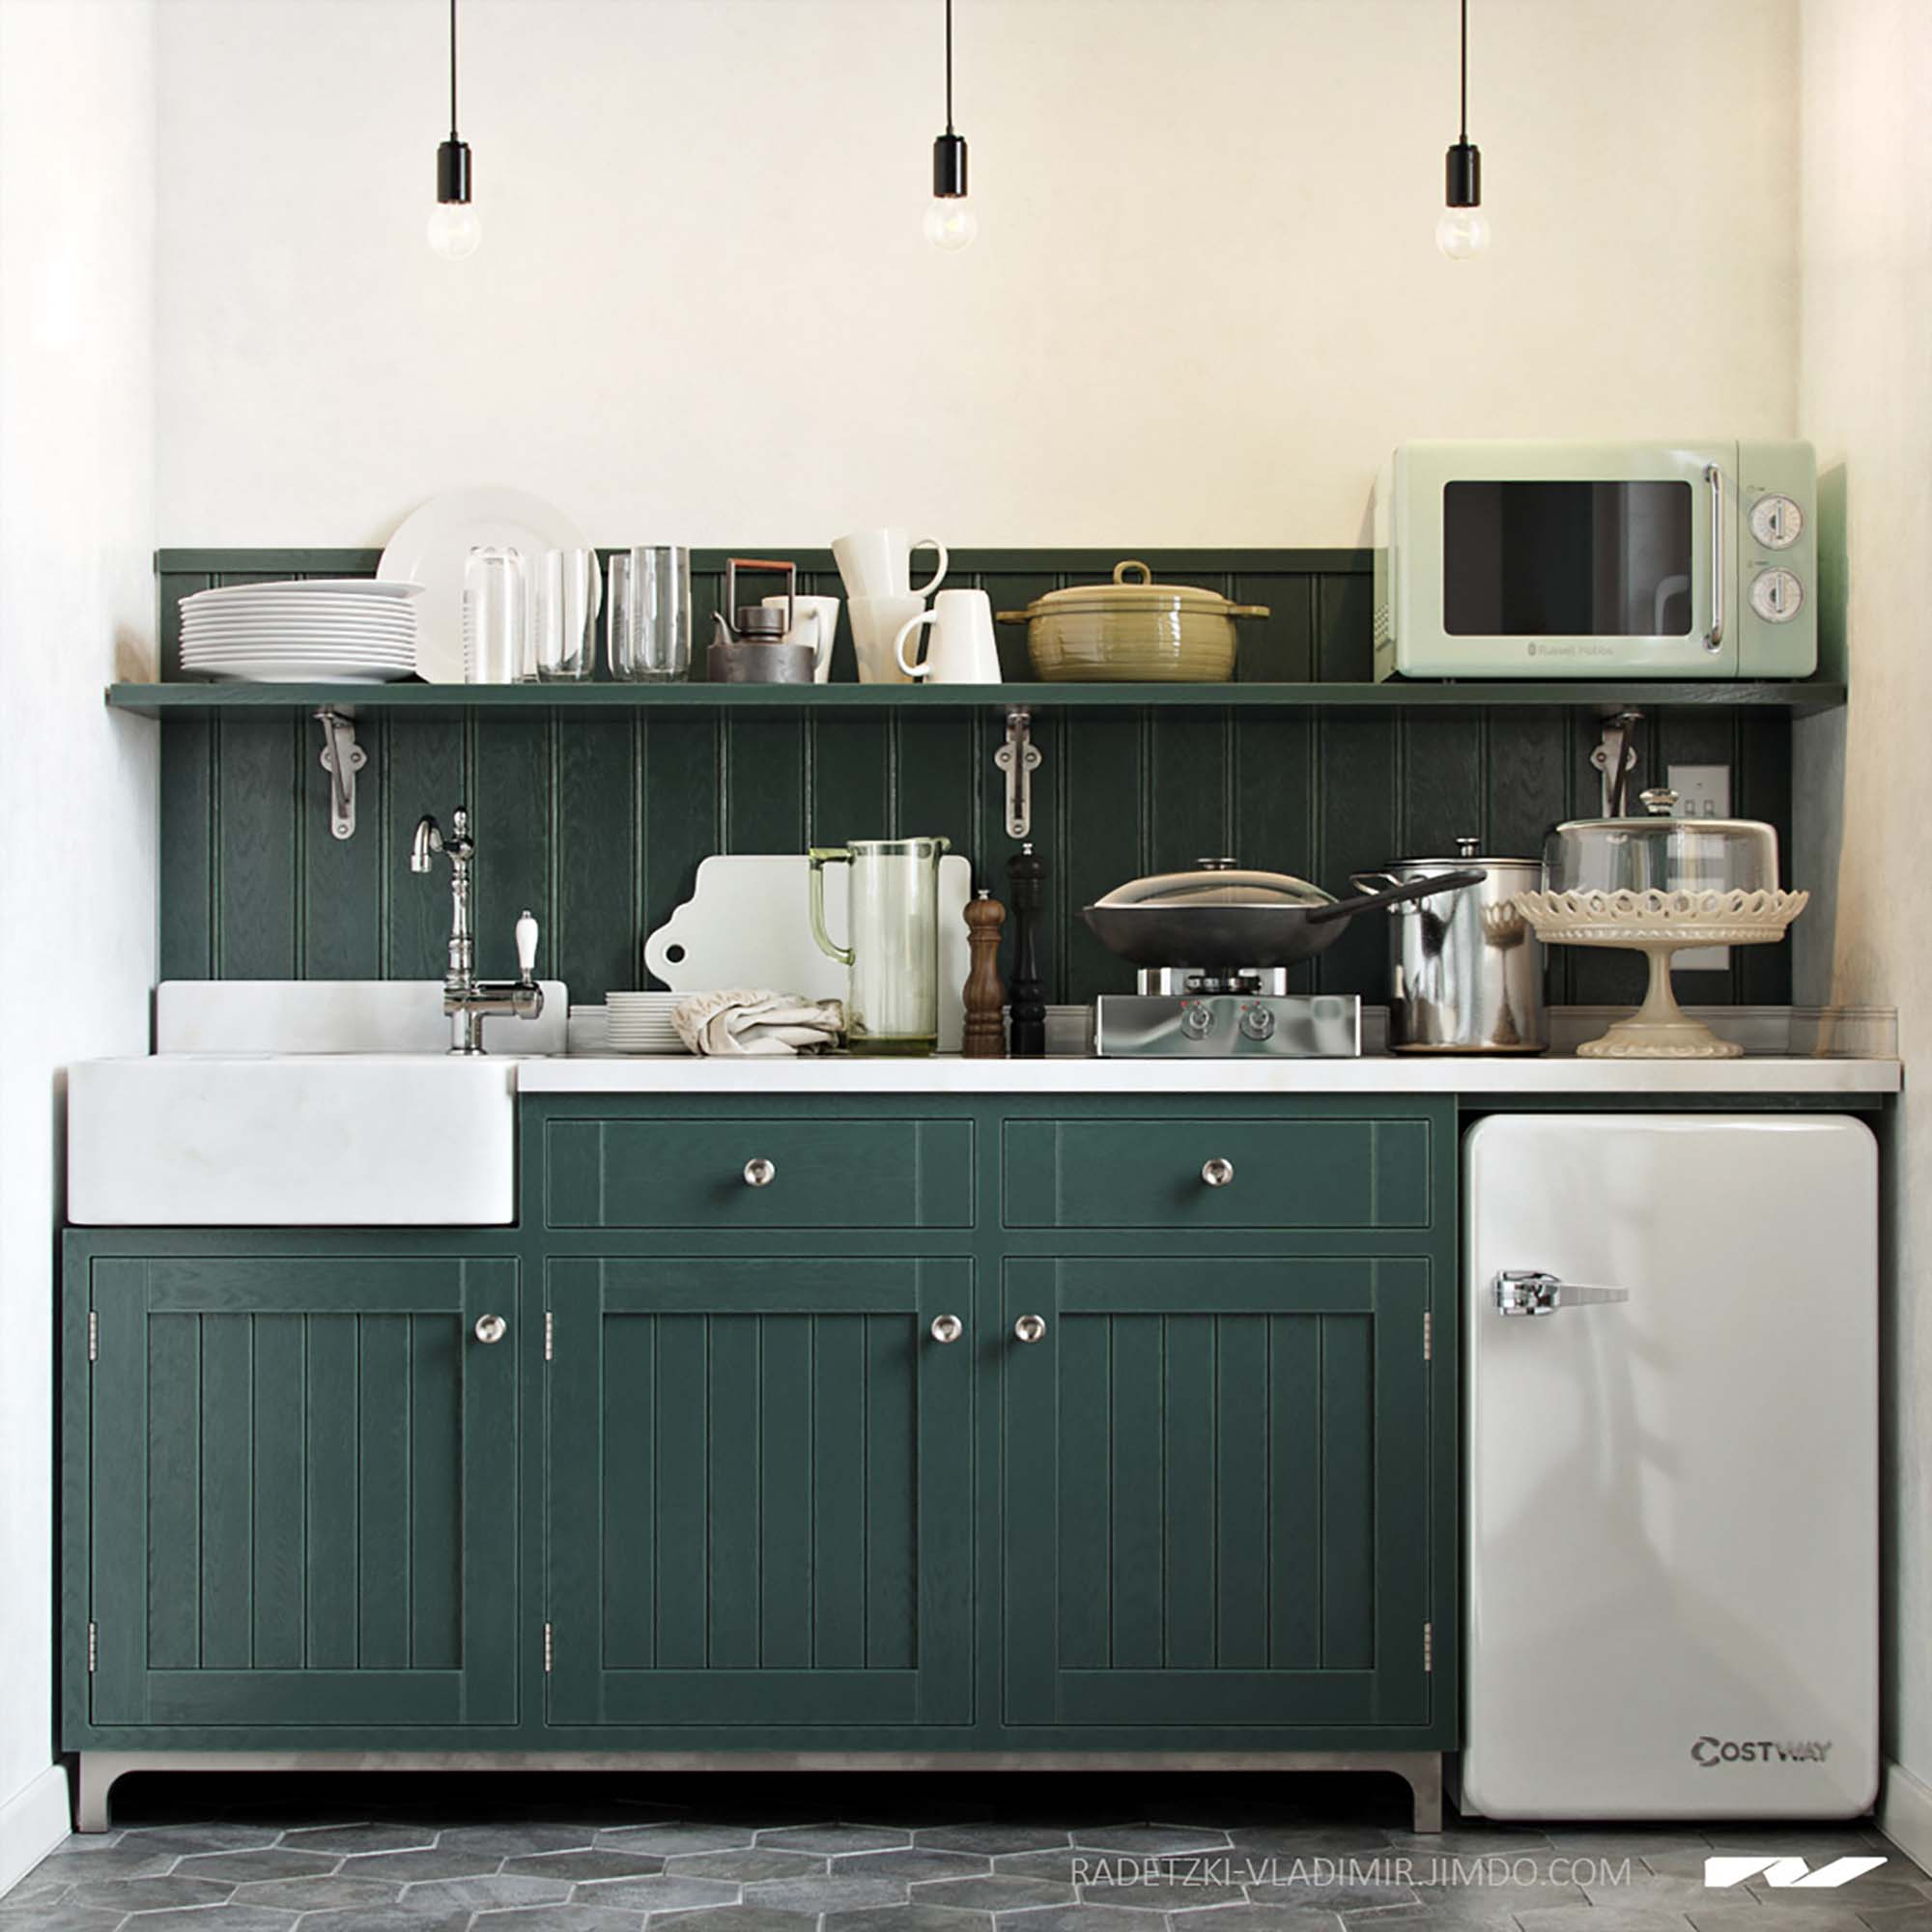 Free Kitchen Set 3d Models